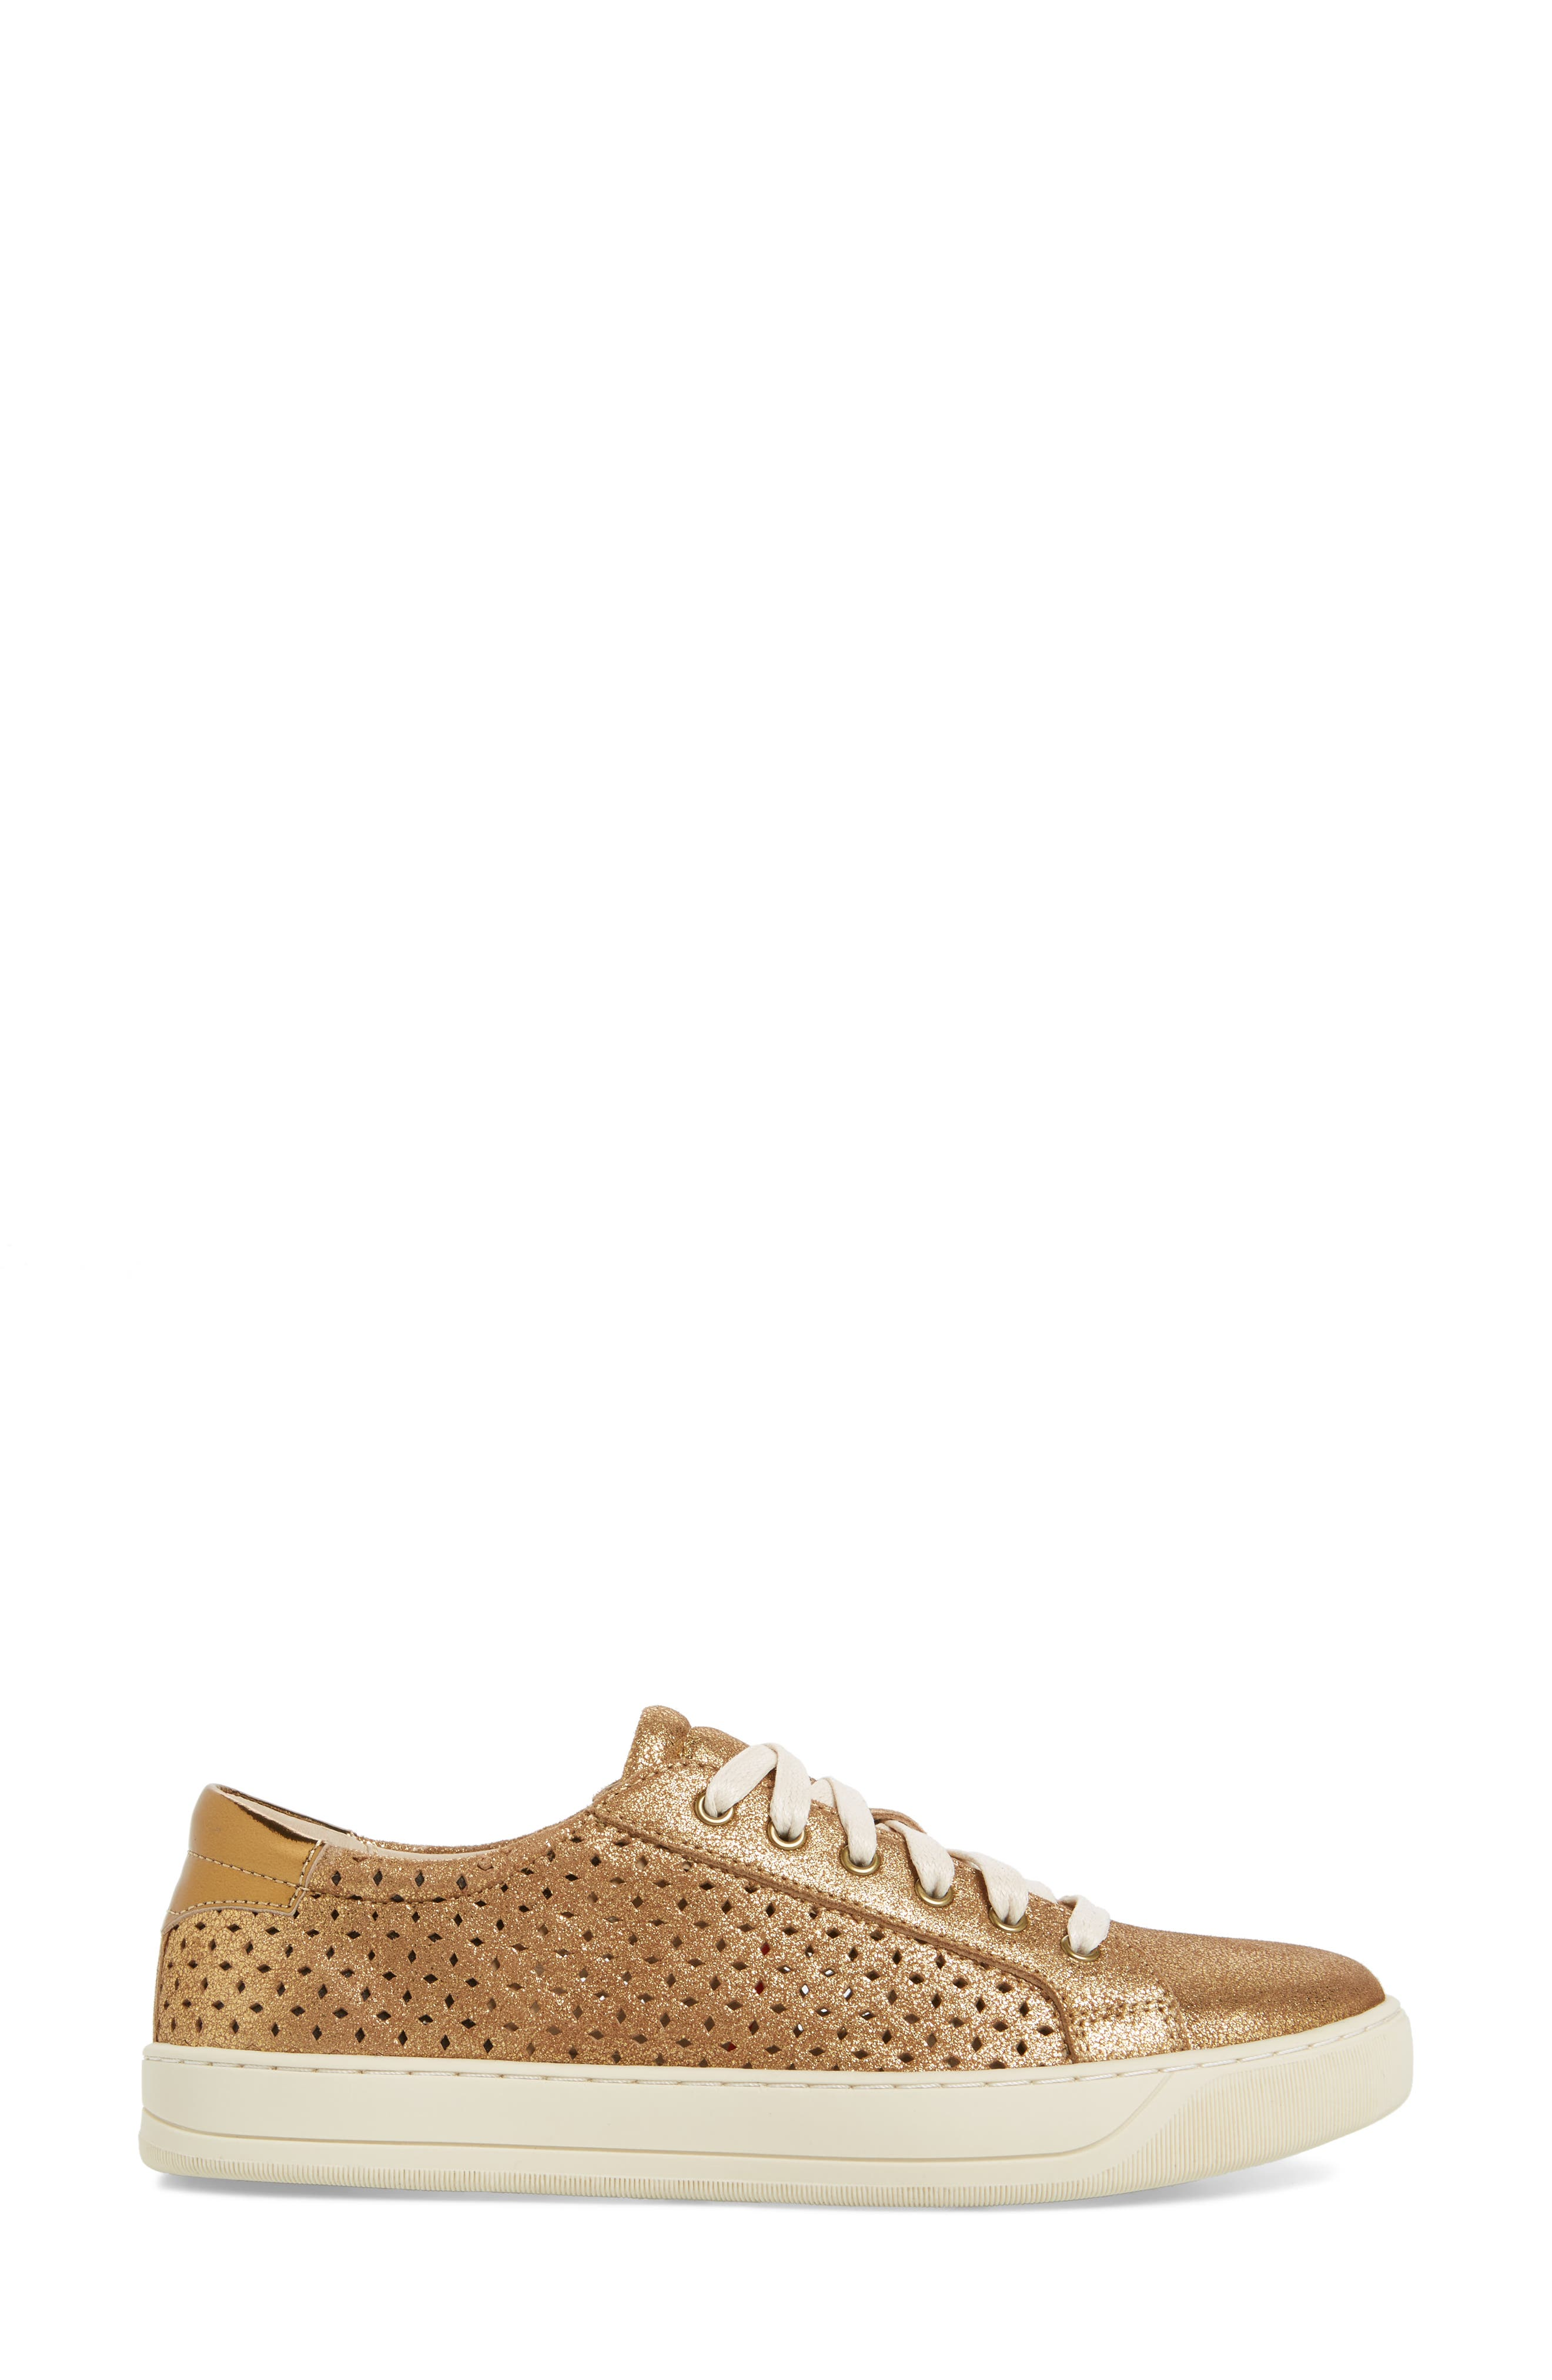 Alternate Image 3  - Johnston & Murphy Emerson Perforated Sneaker (Women)